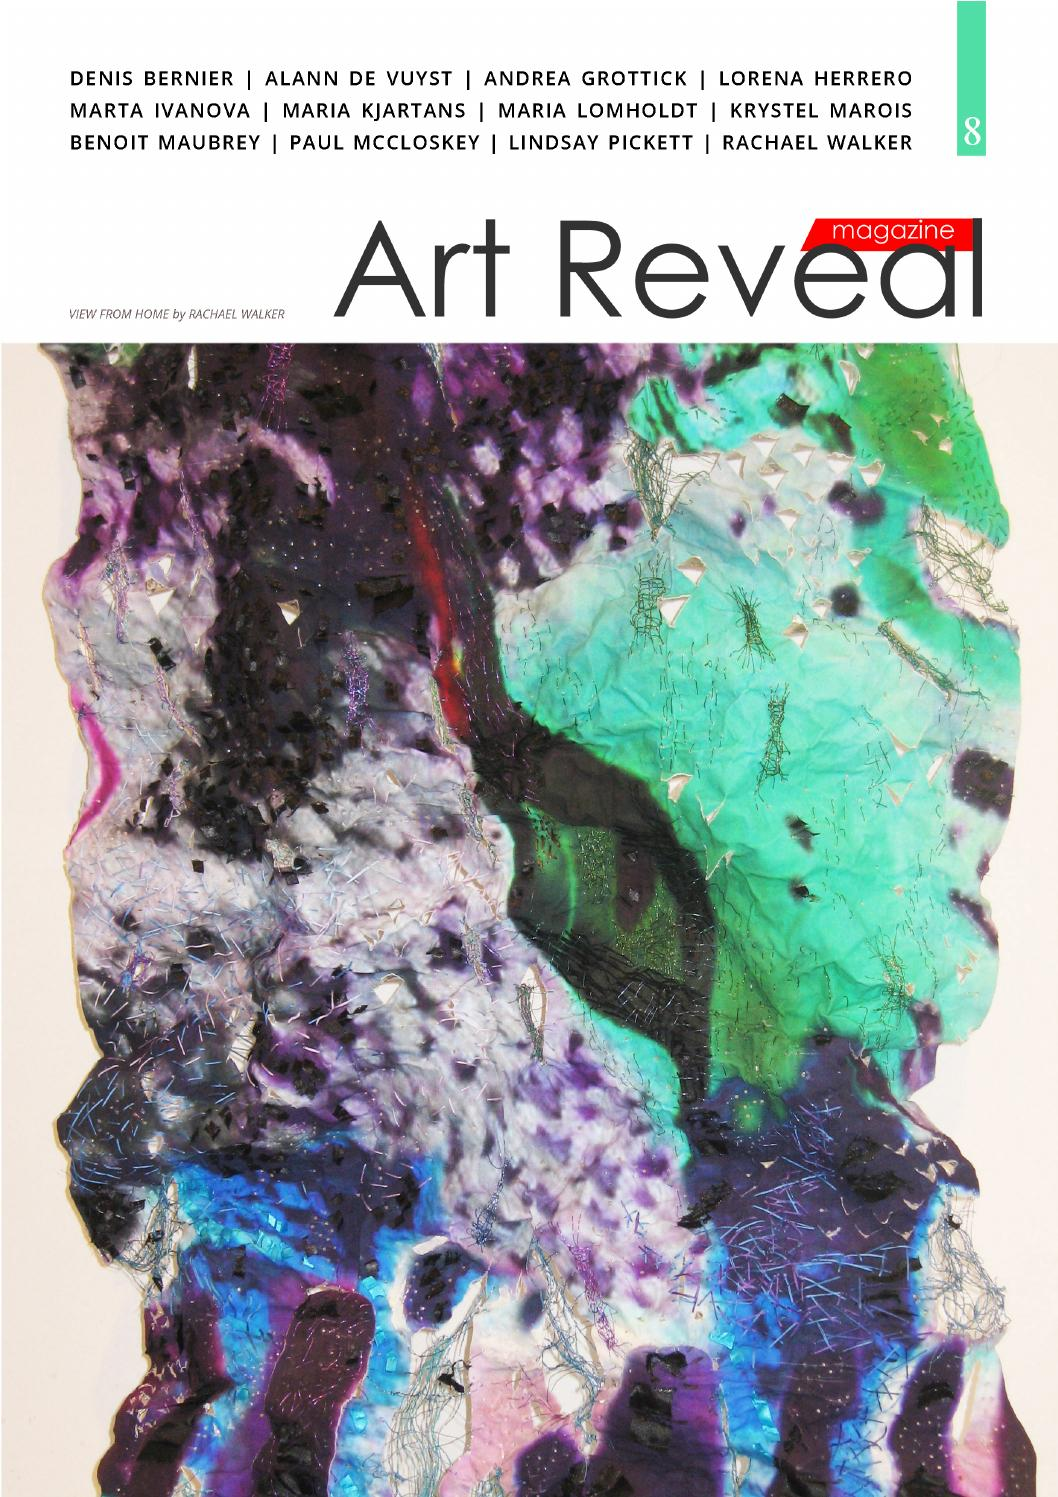 Art Reveal Magazine no. 8 by Art Reveal Magazine - issuu